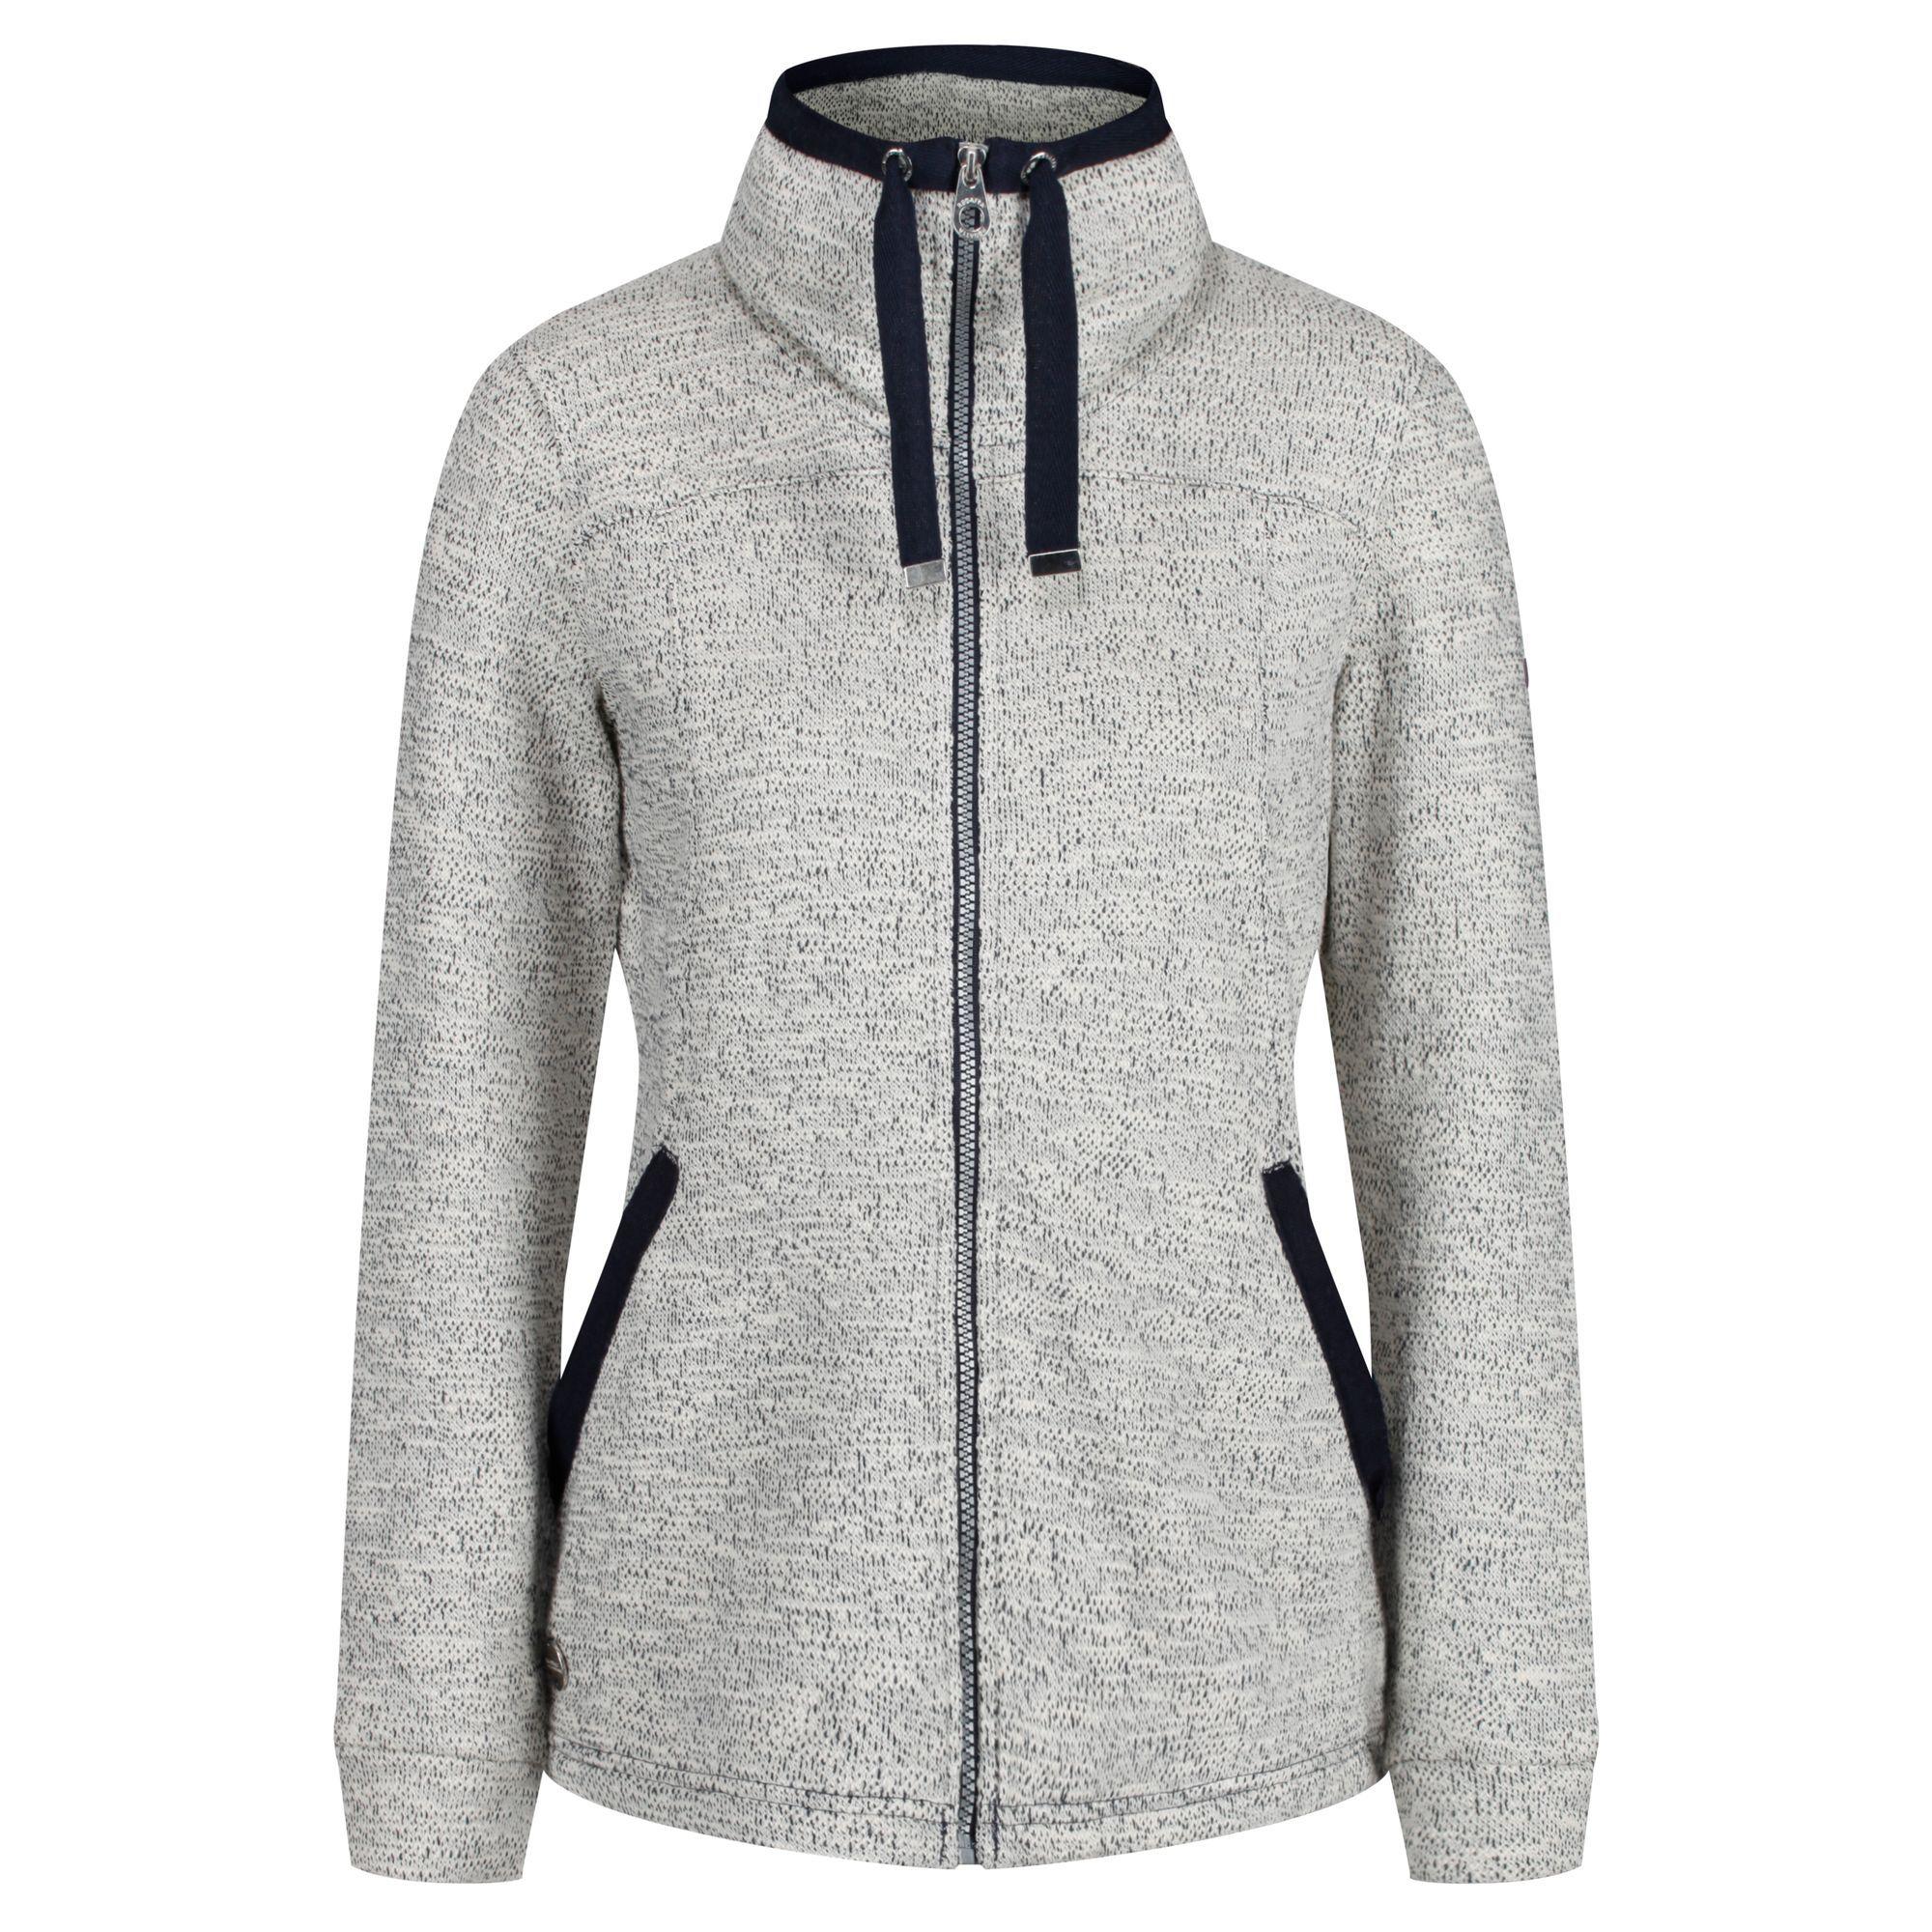 Regatta-Odetta-Womens-Warm-Curved-Full-Zip-Fleece-Jacket-RRP-50 thumbnail 16